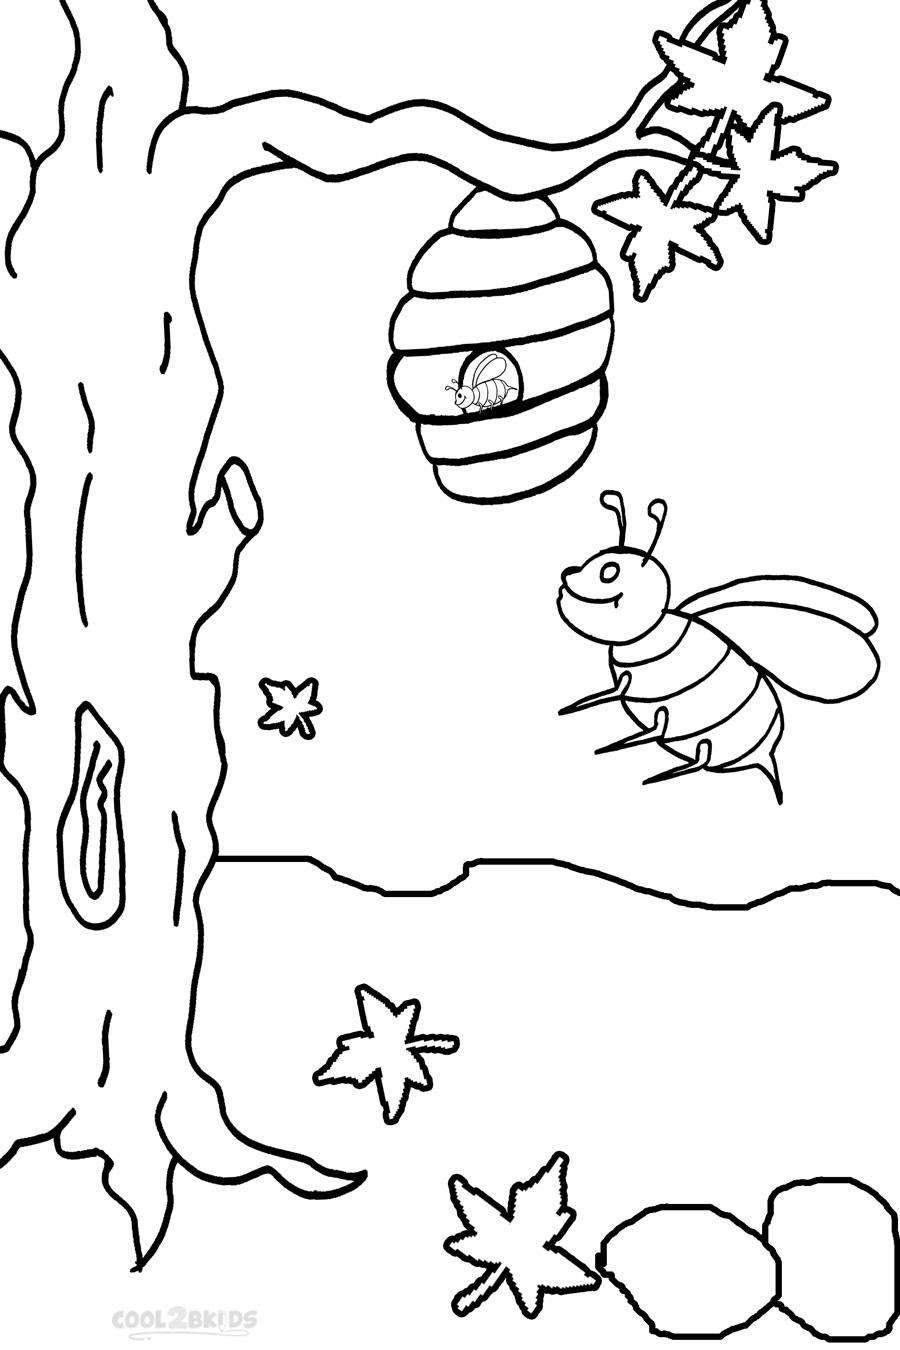 bumble bee coloring sheets printable bumble bee coloring pages for kids cool2bkids coloring bumble bee sheets